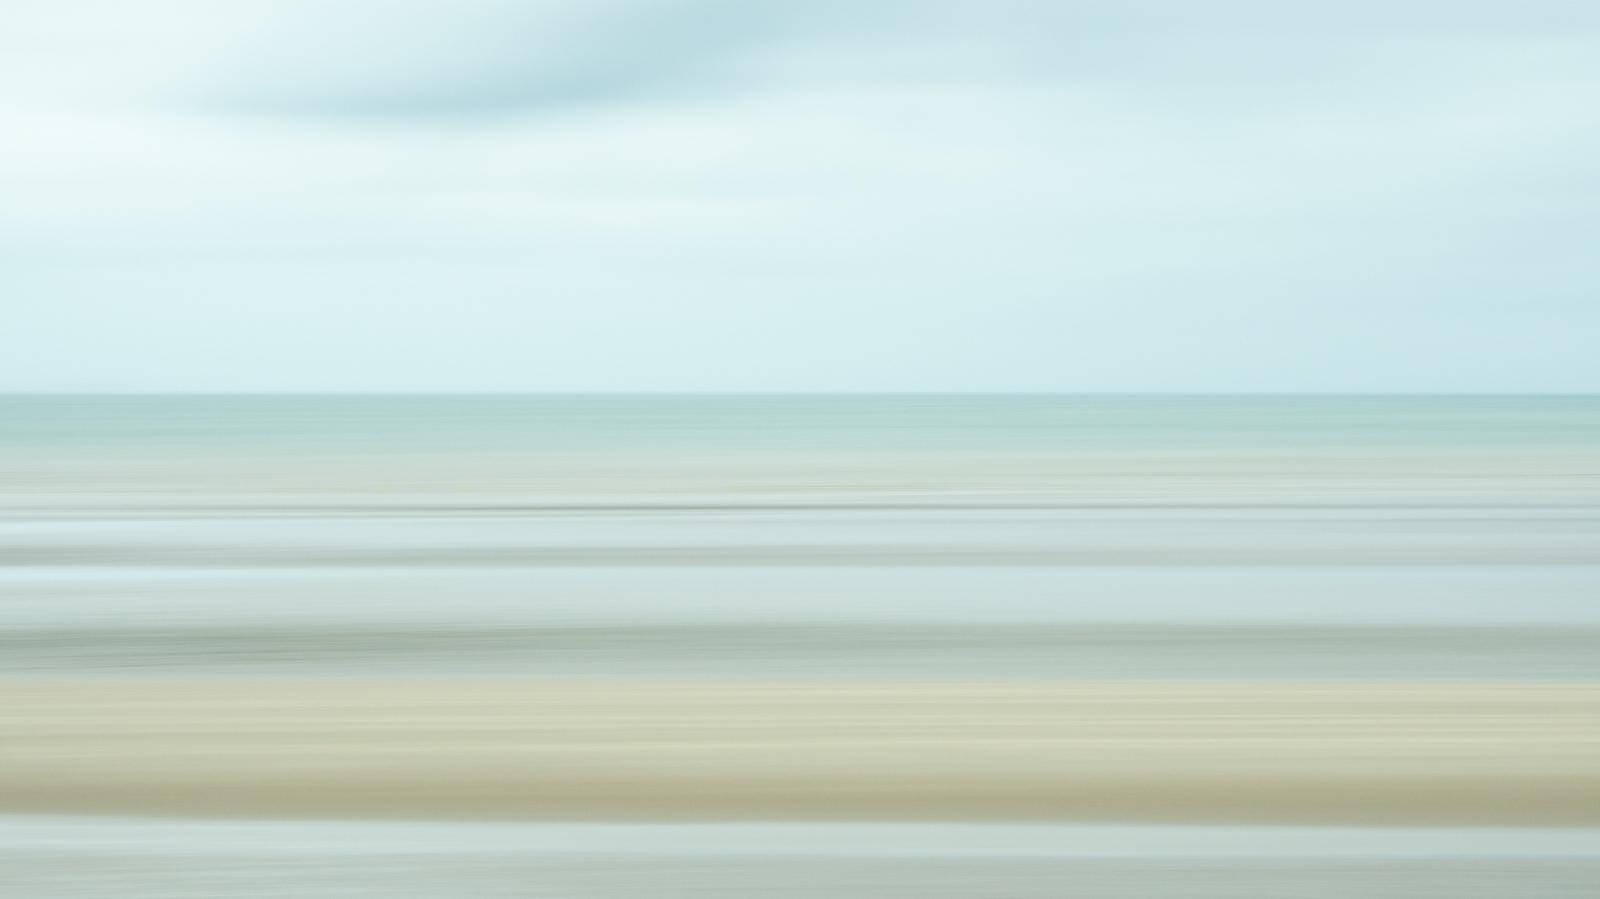 209 The Beach.jpg